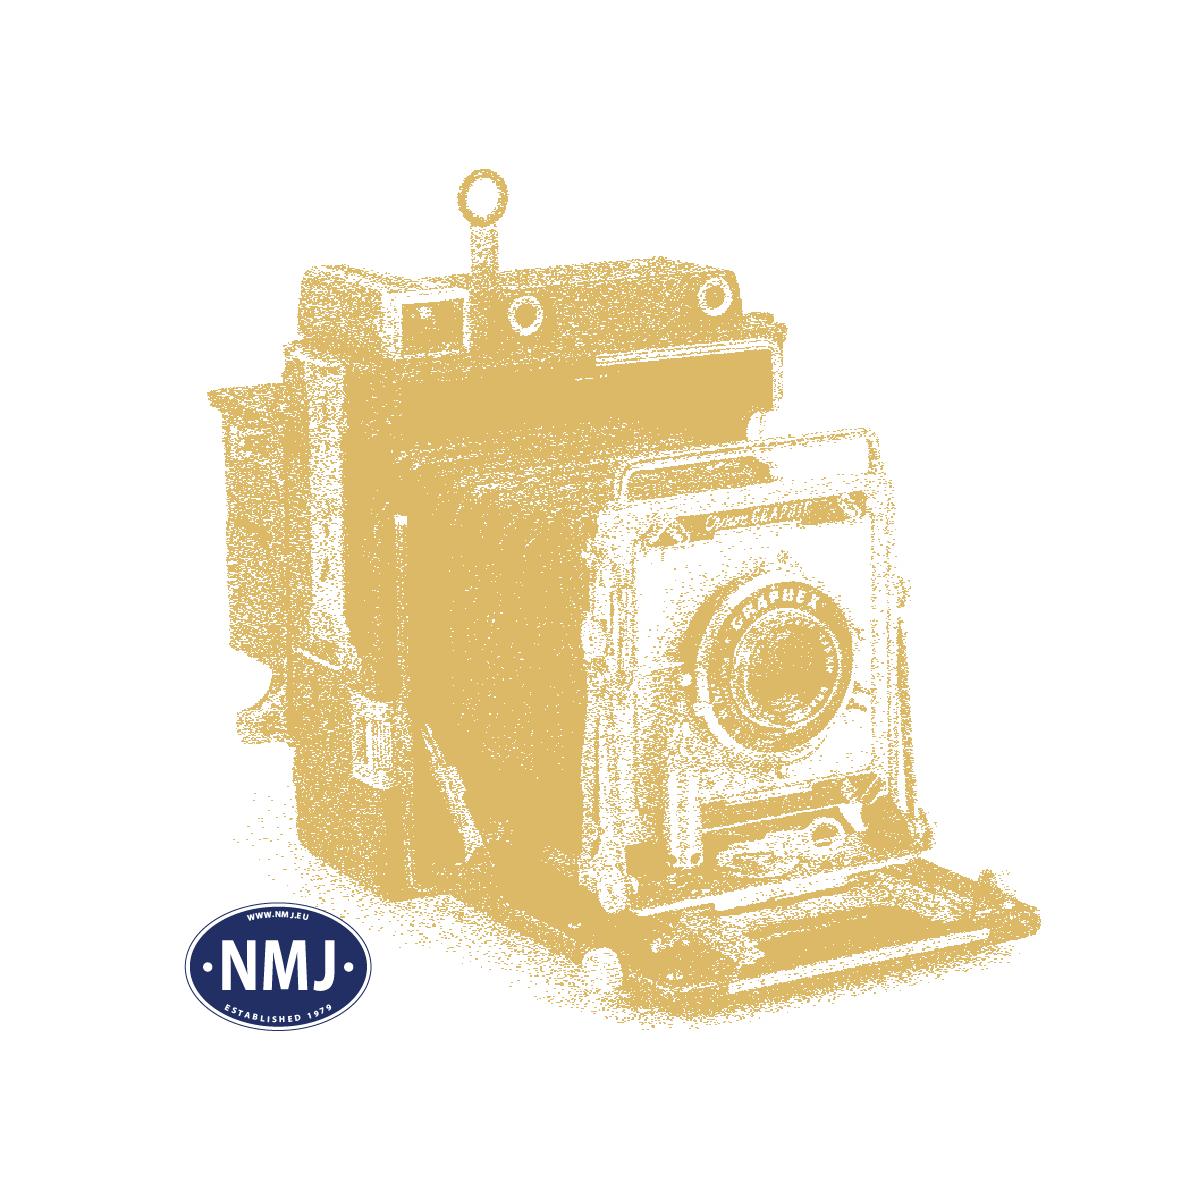 NMJT94105 - NMJ Topline NSB Gods El14 2179, Grå/Sort, DCC m/ Lyd